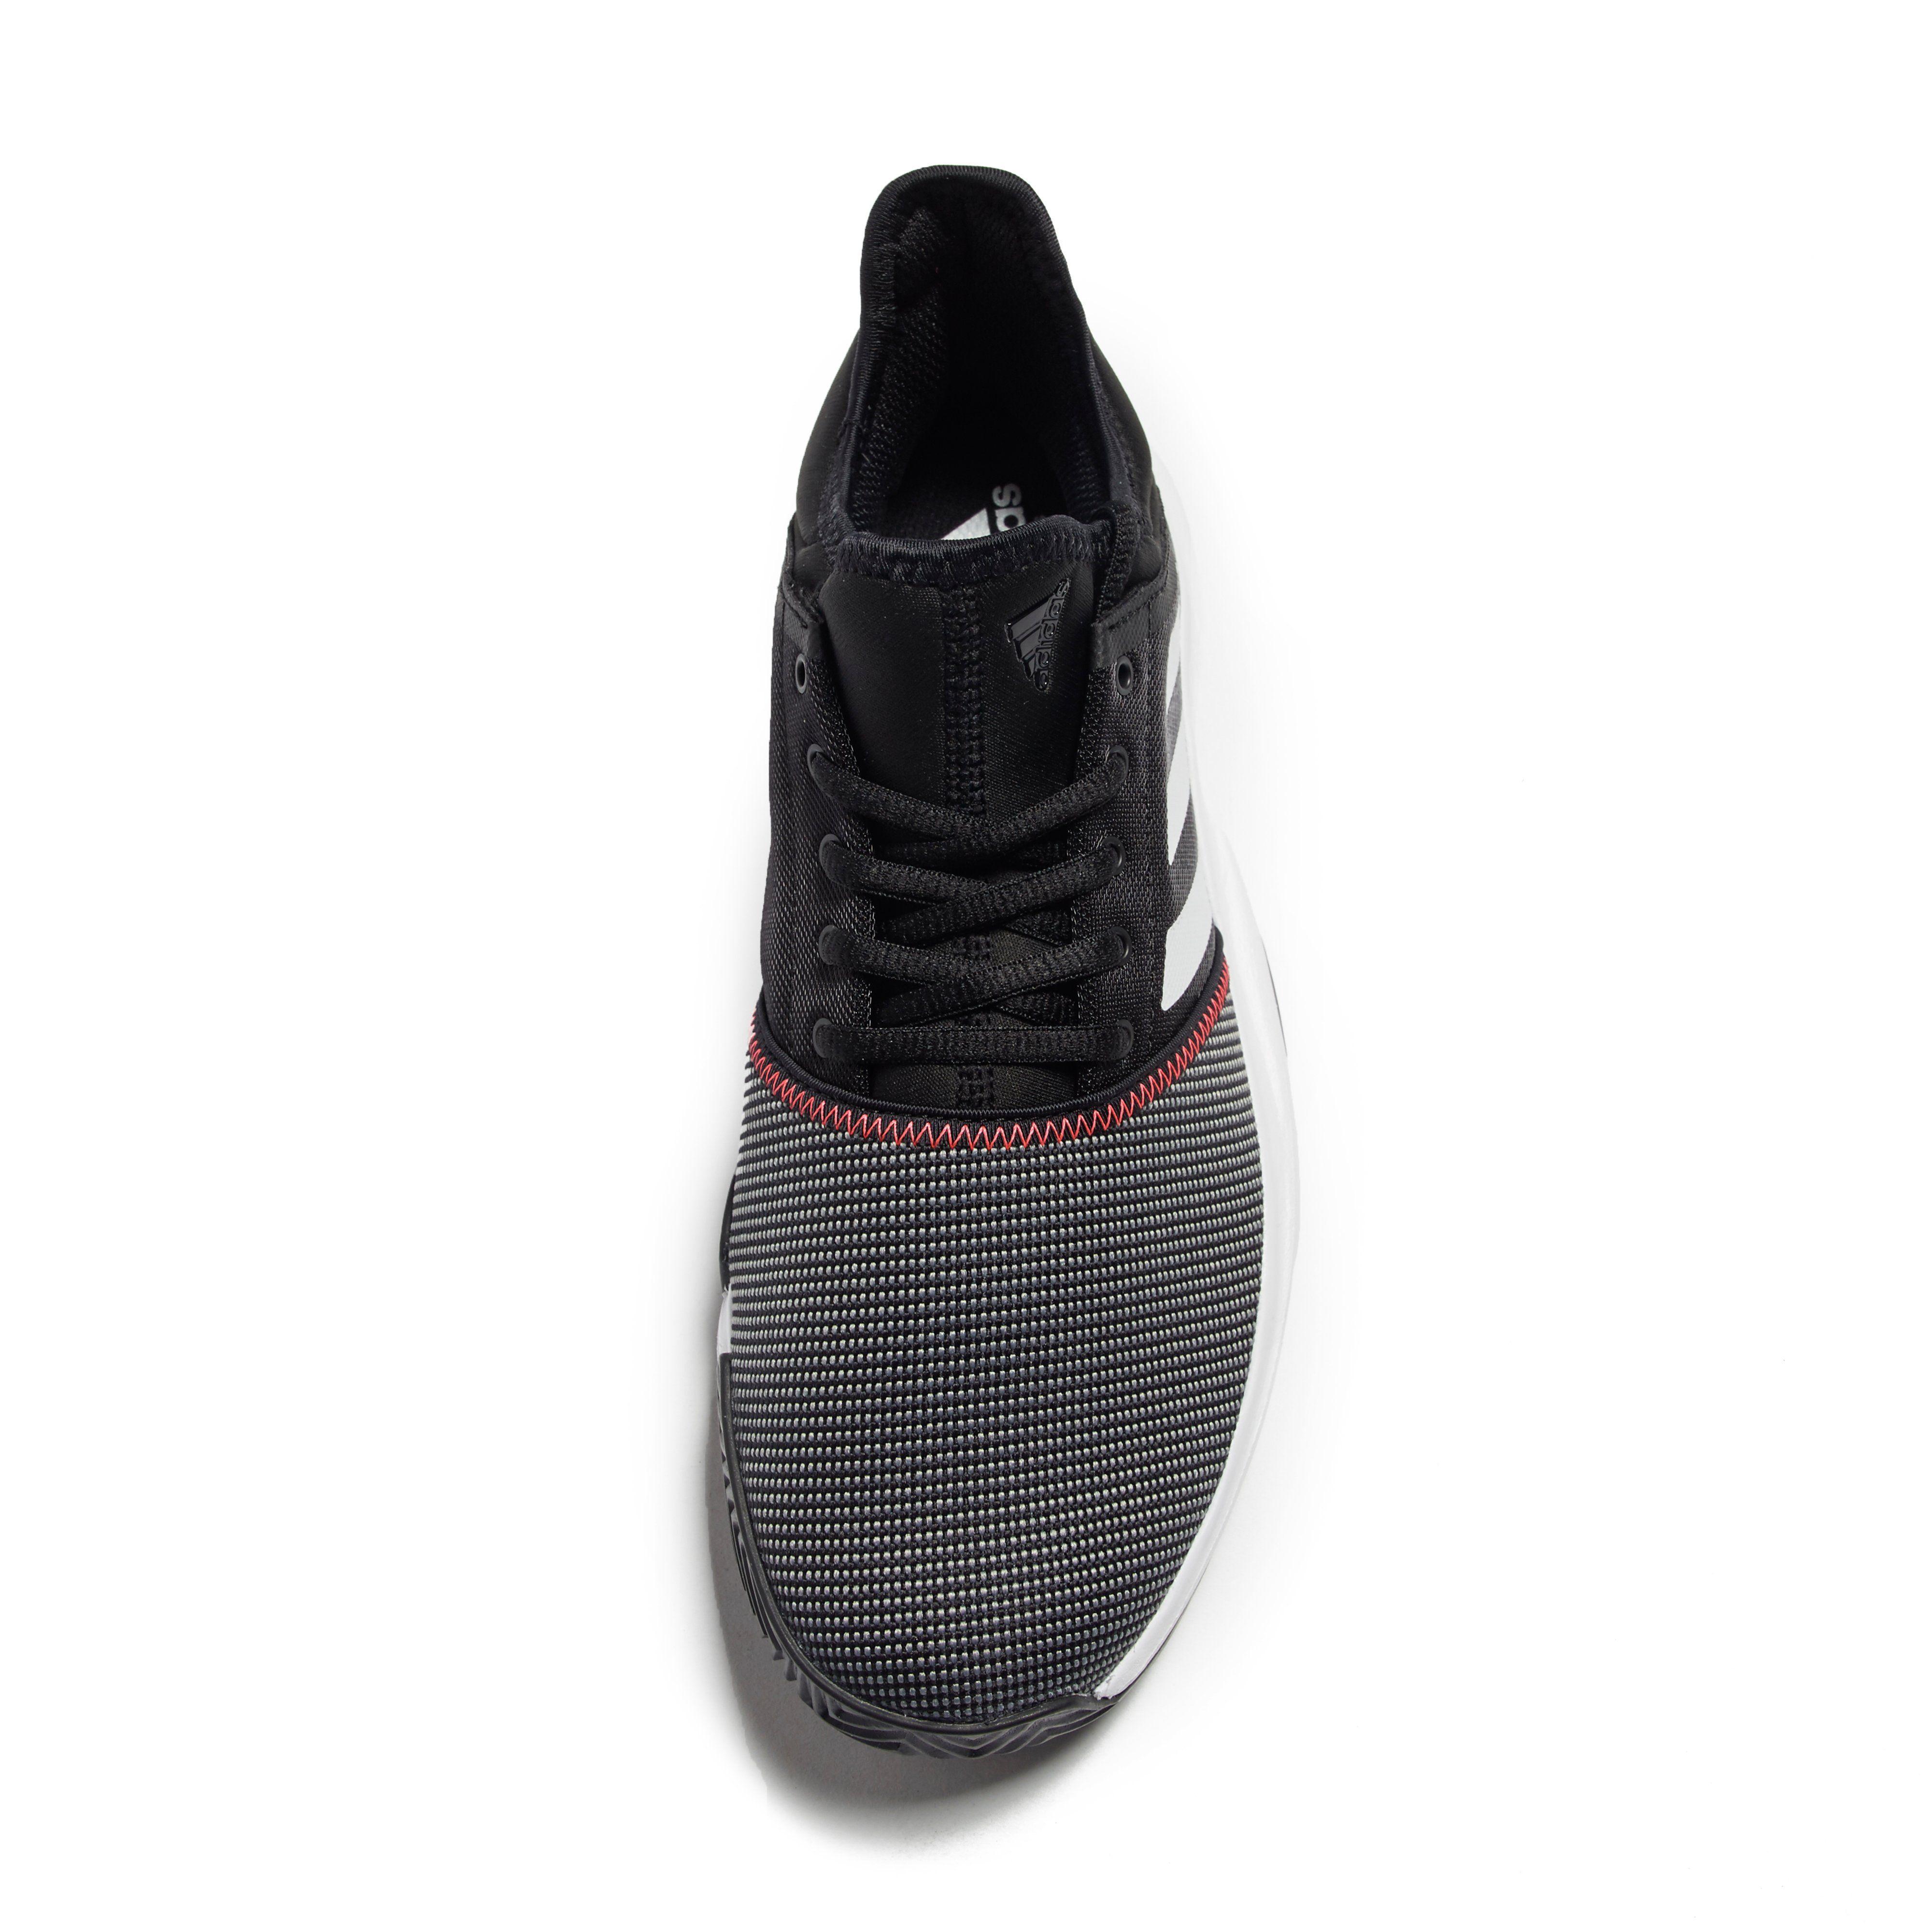 adidas Gamecourt Men's Tennis Shoes